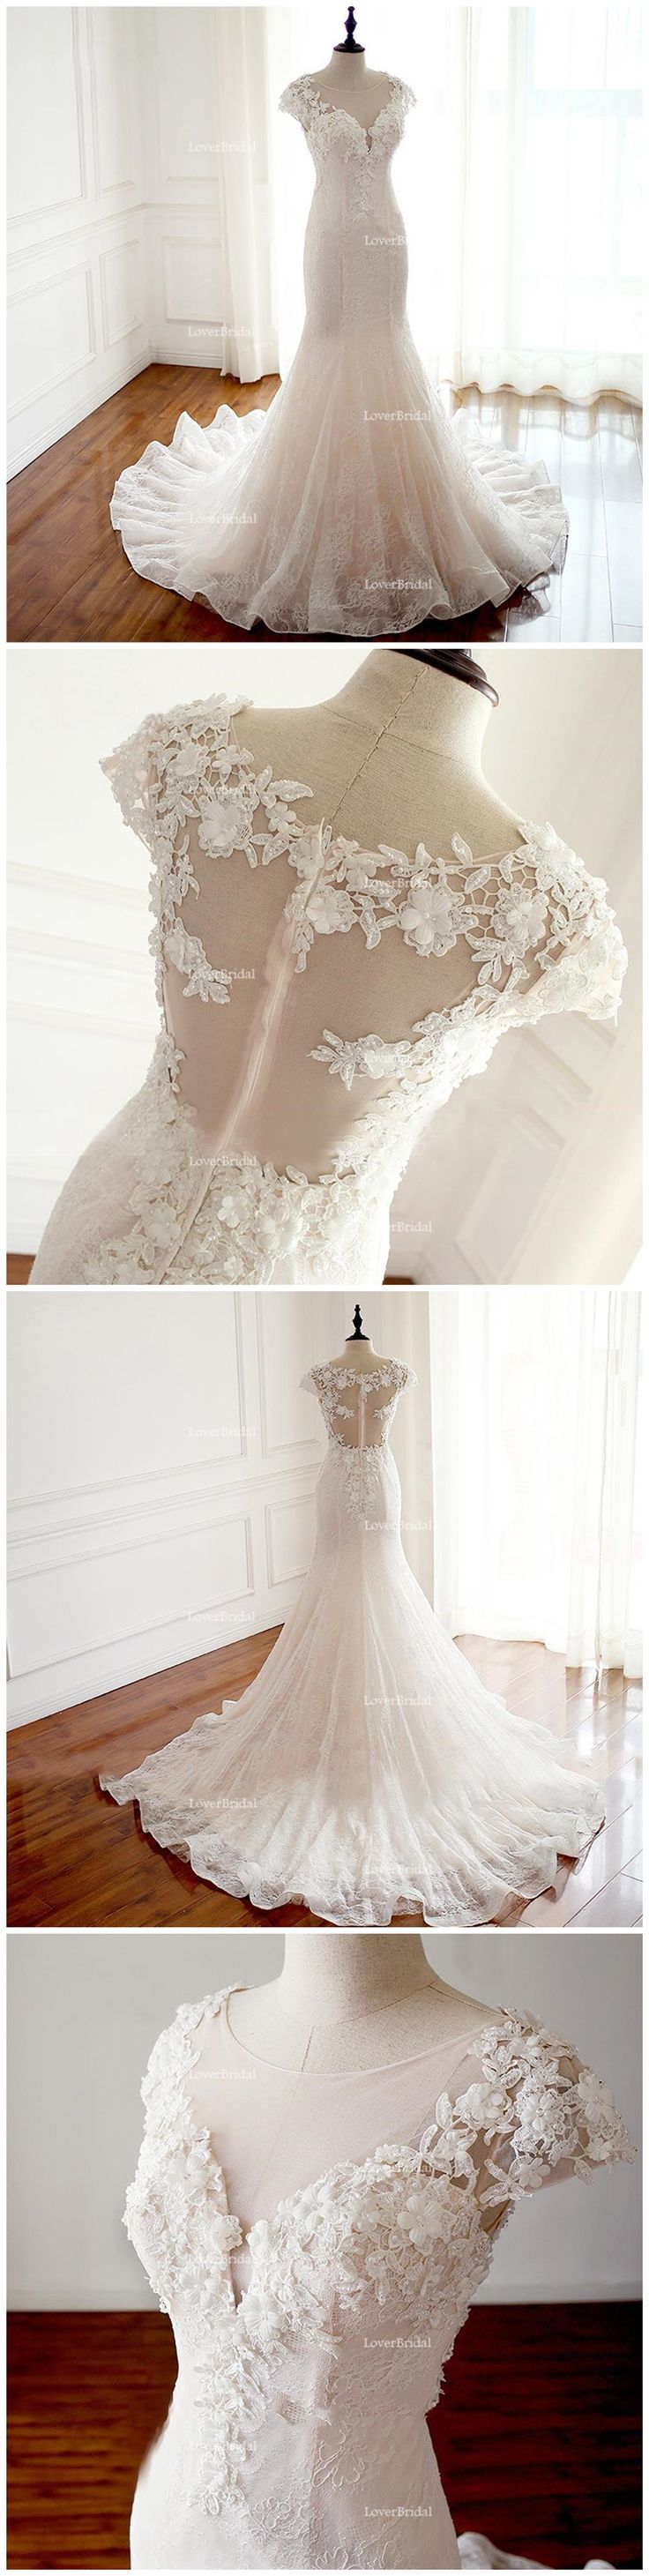 2018 Sexy See Through Cap Sleeve Lace Mermaid Wedding Bridal Dresses, Affordable Custom Made Wedding Bridal Dresses, WD268